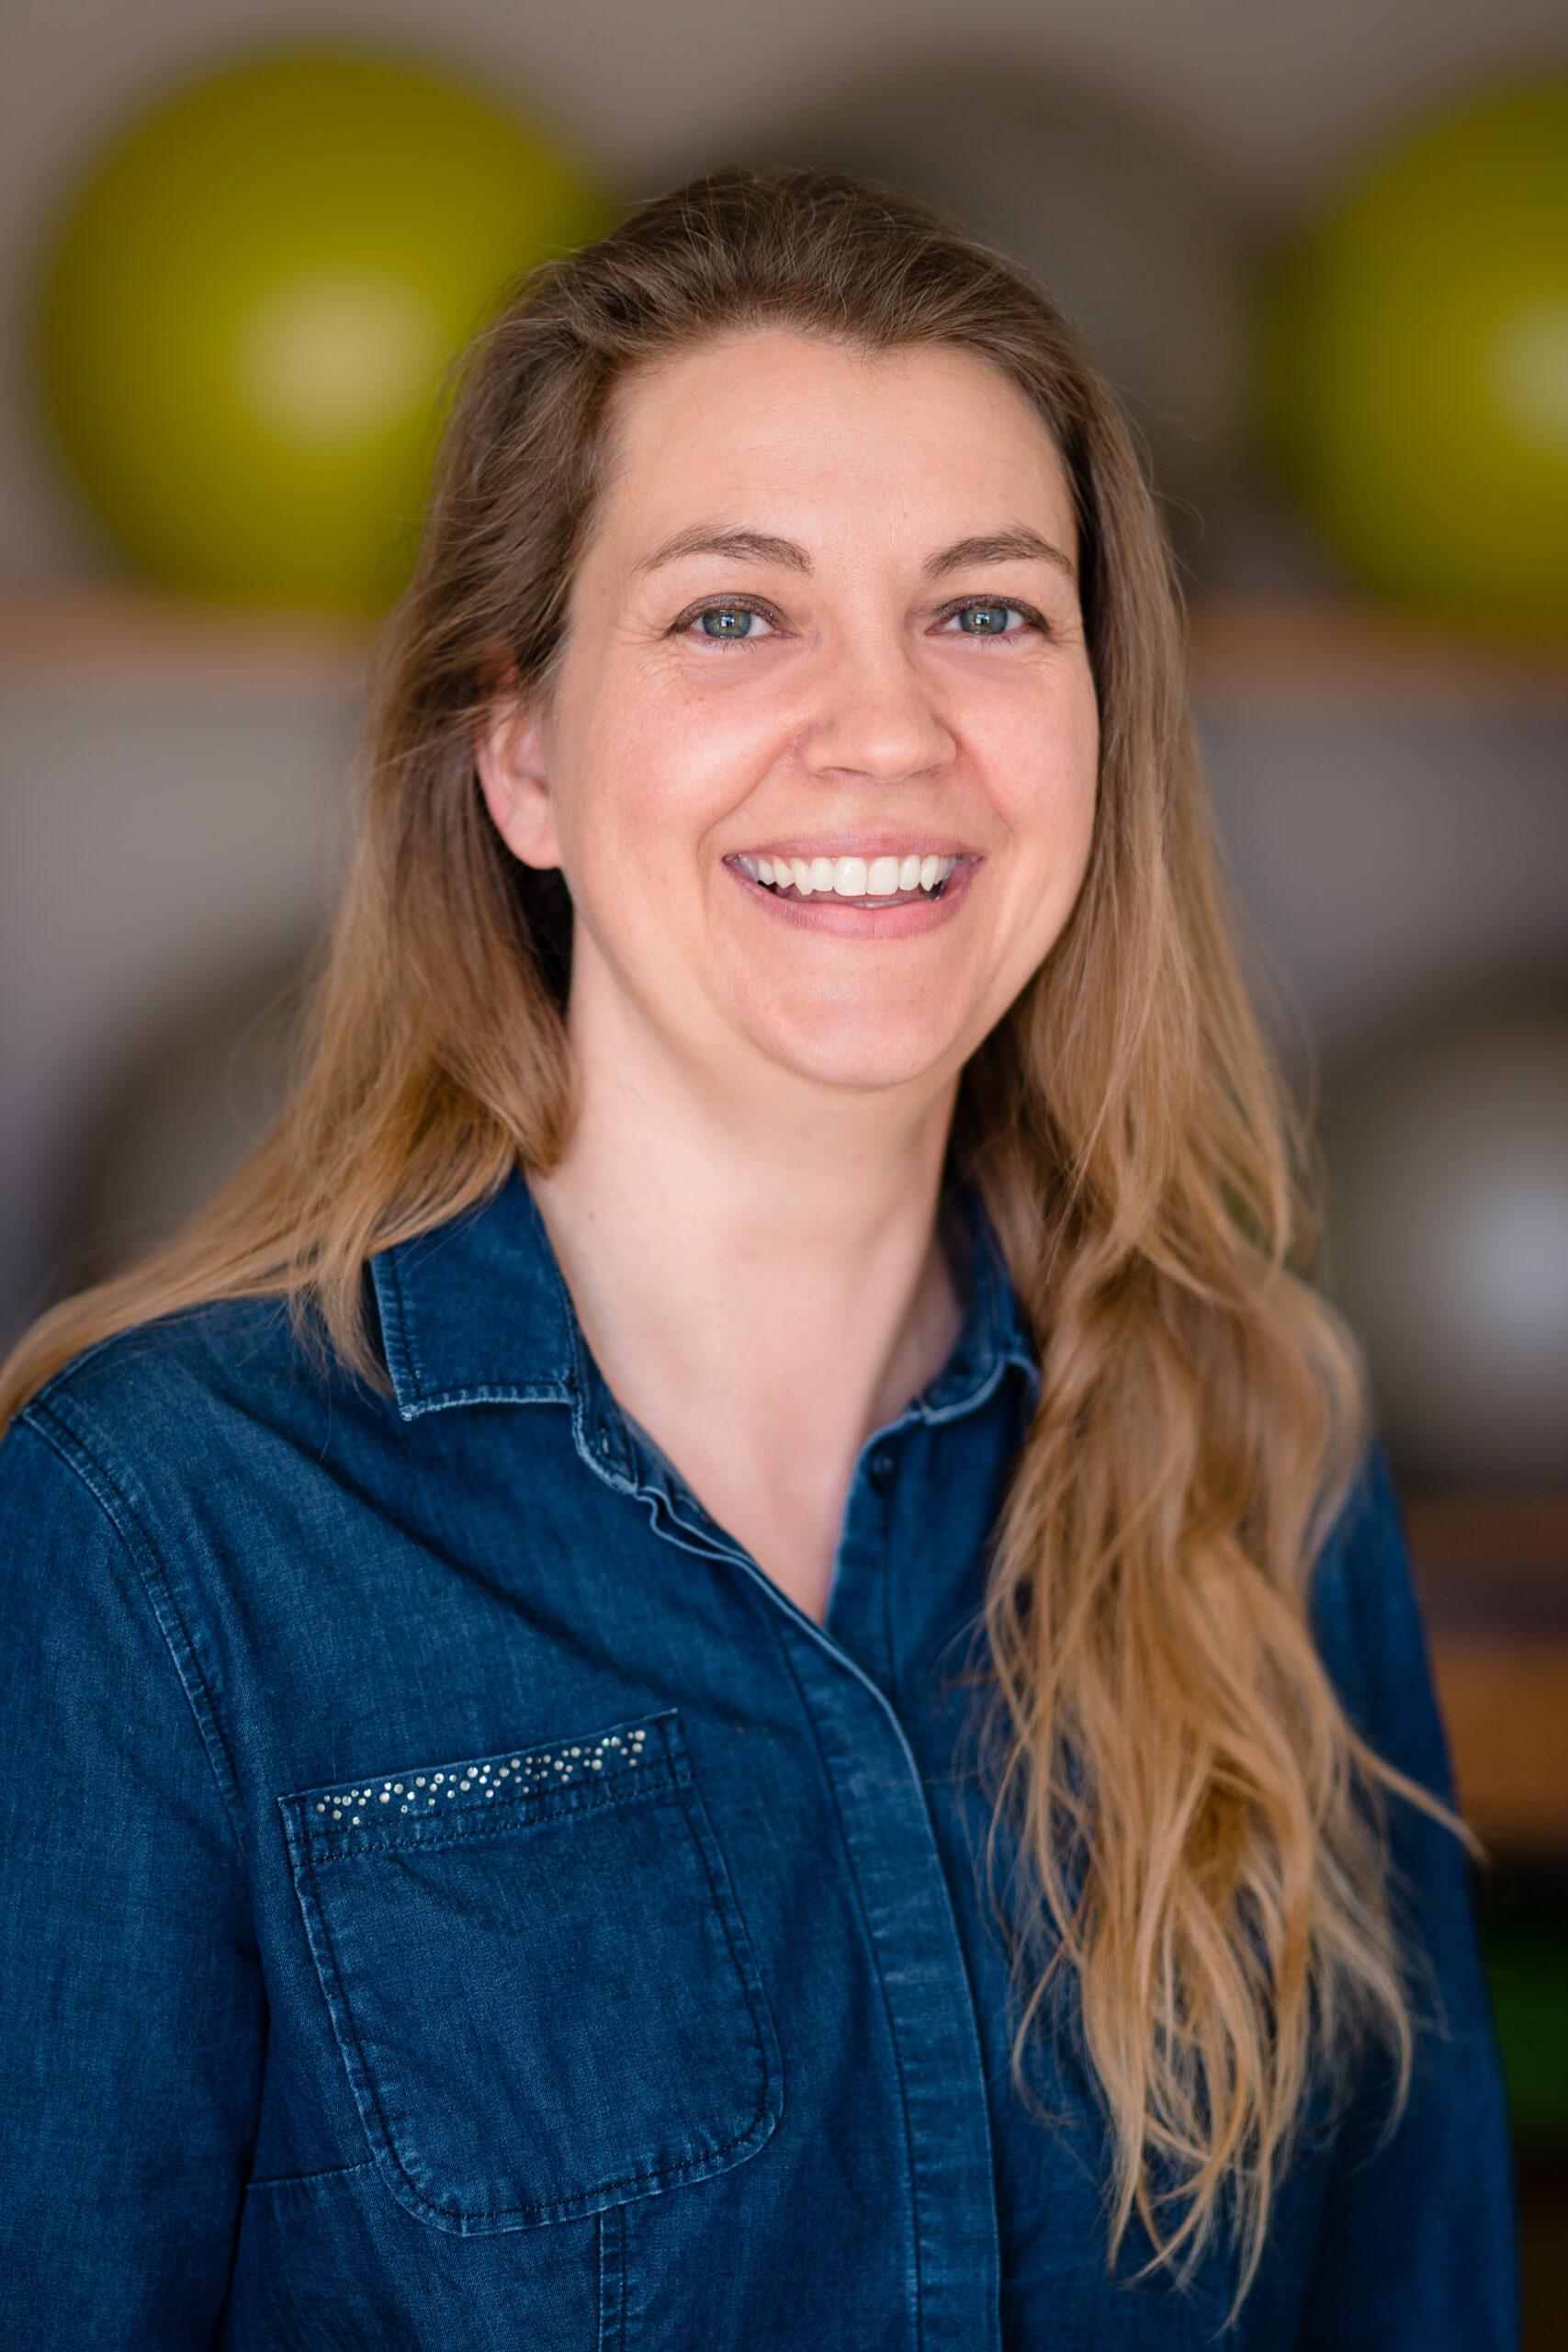 GfG Familienbegleiterin Sabine Fricke